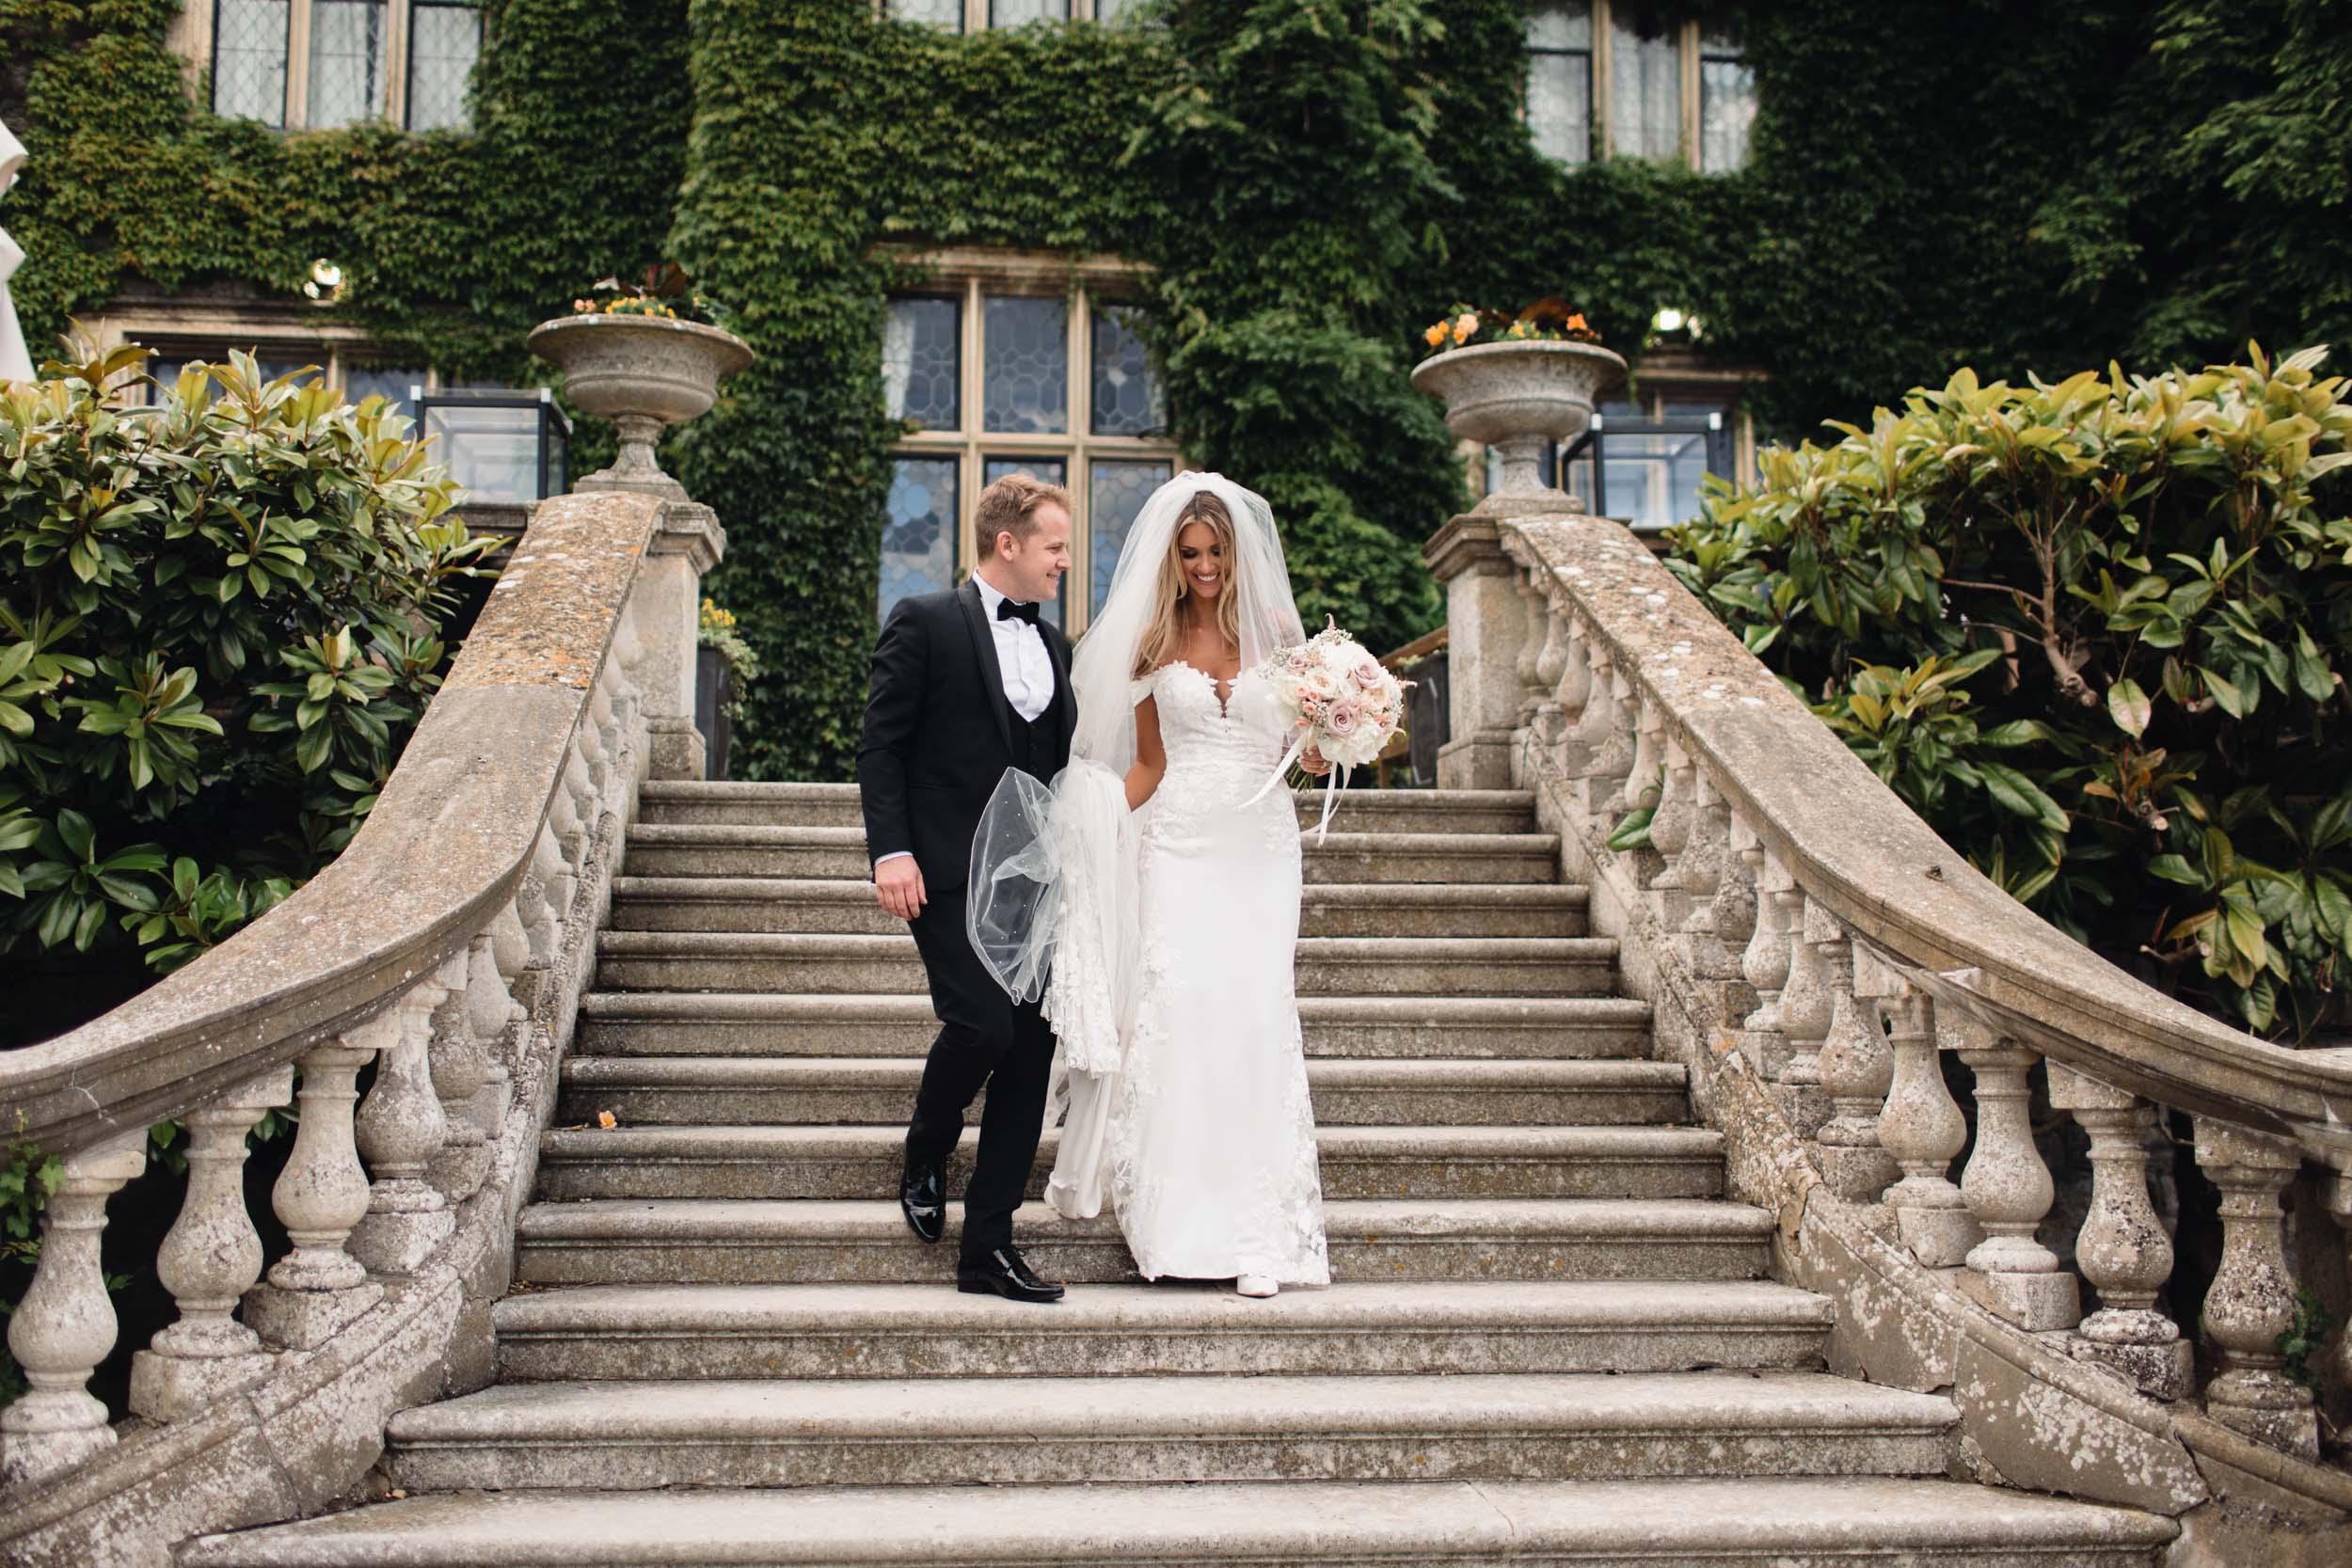 Rebecca Searle Wedding Photography Surrey London Luxury 73.jpg